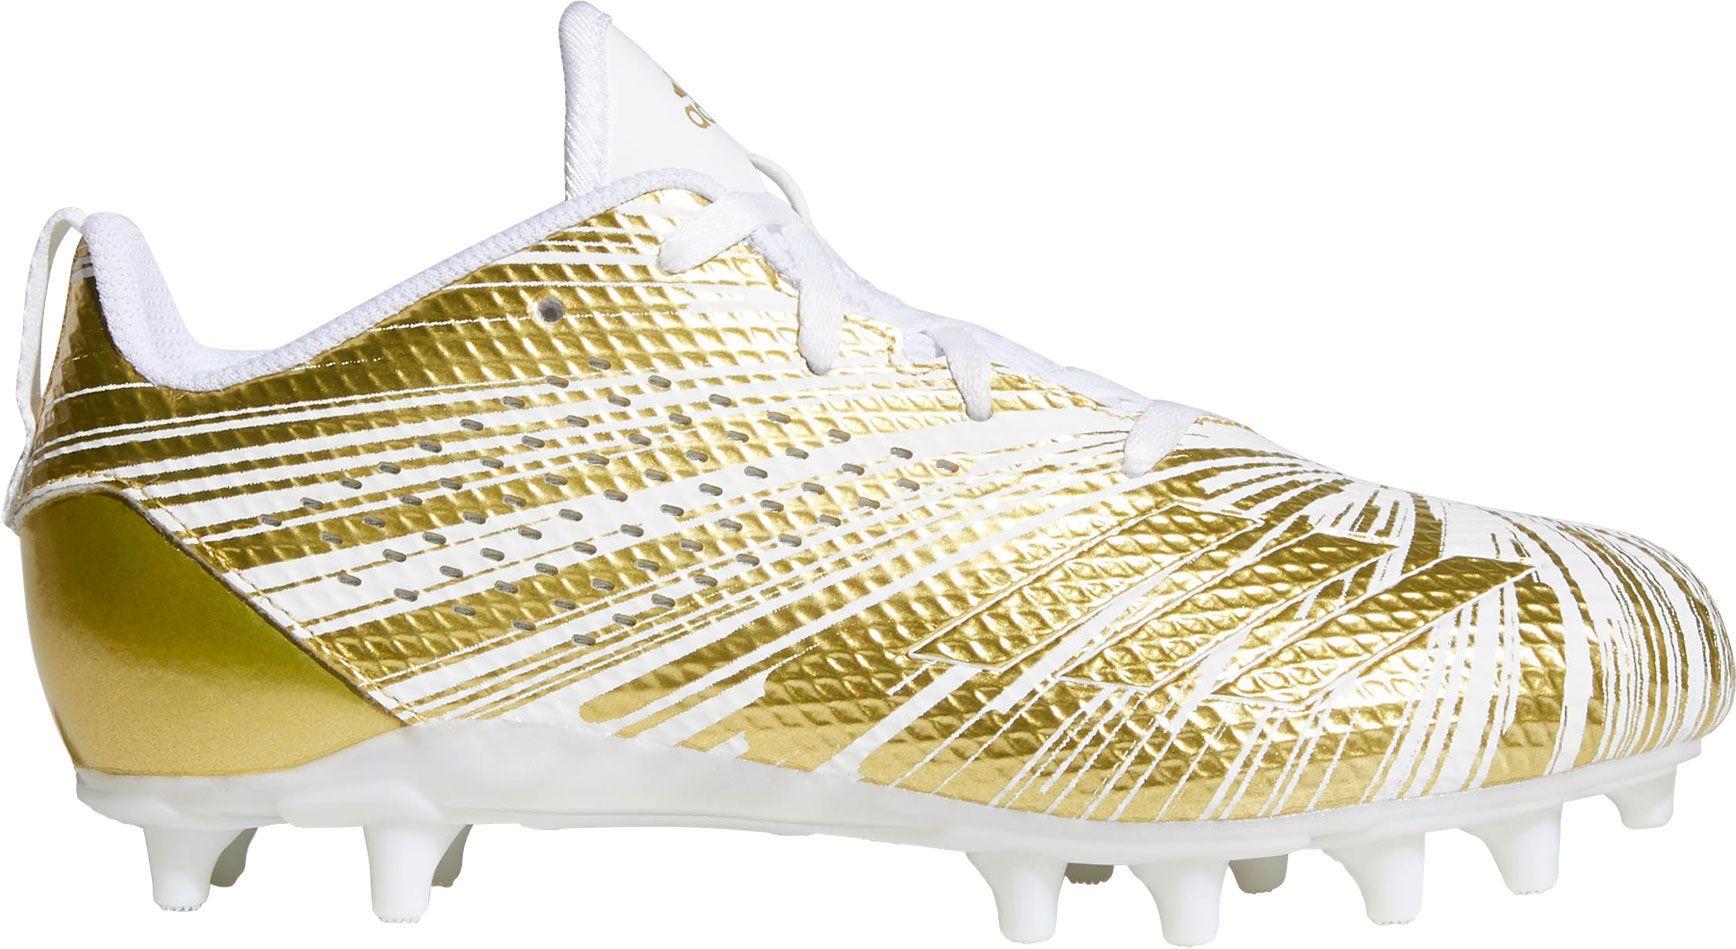 Star 7.0 Football Cleats